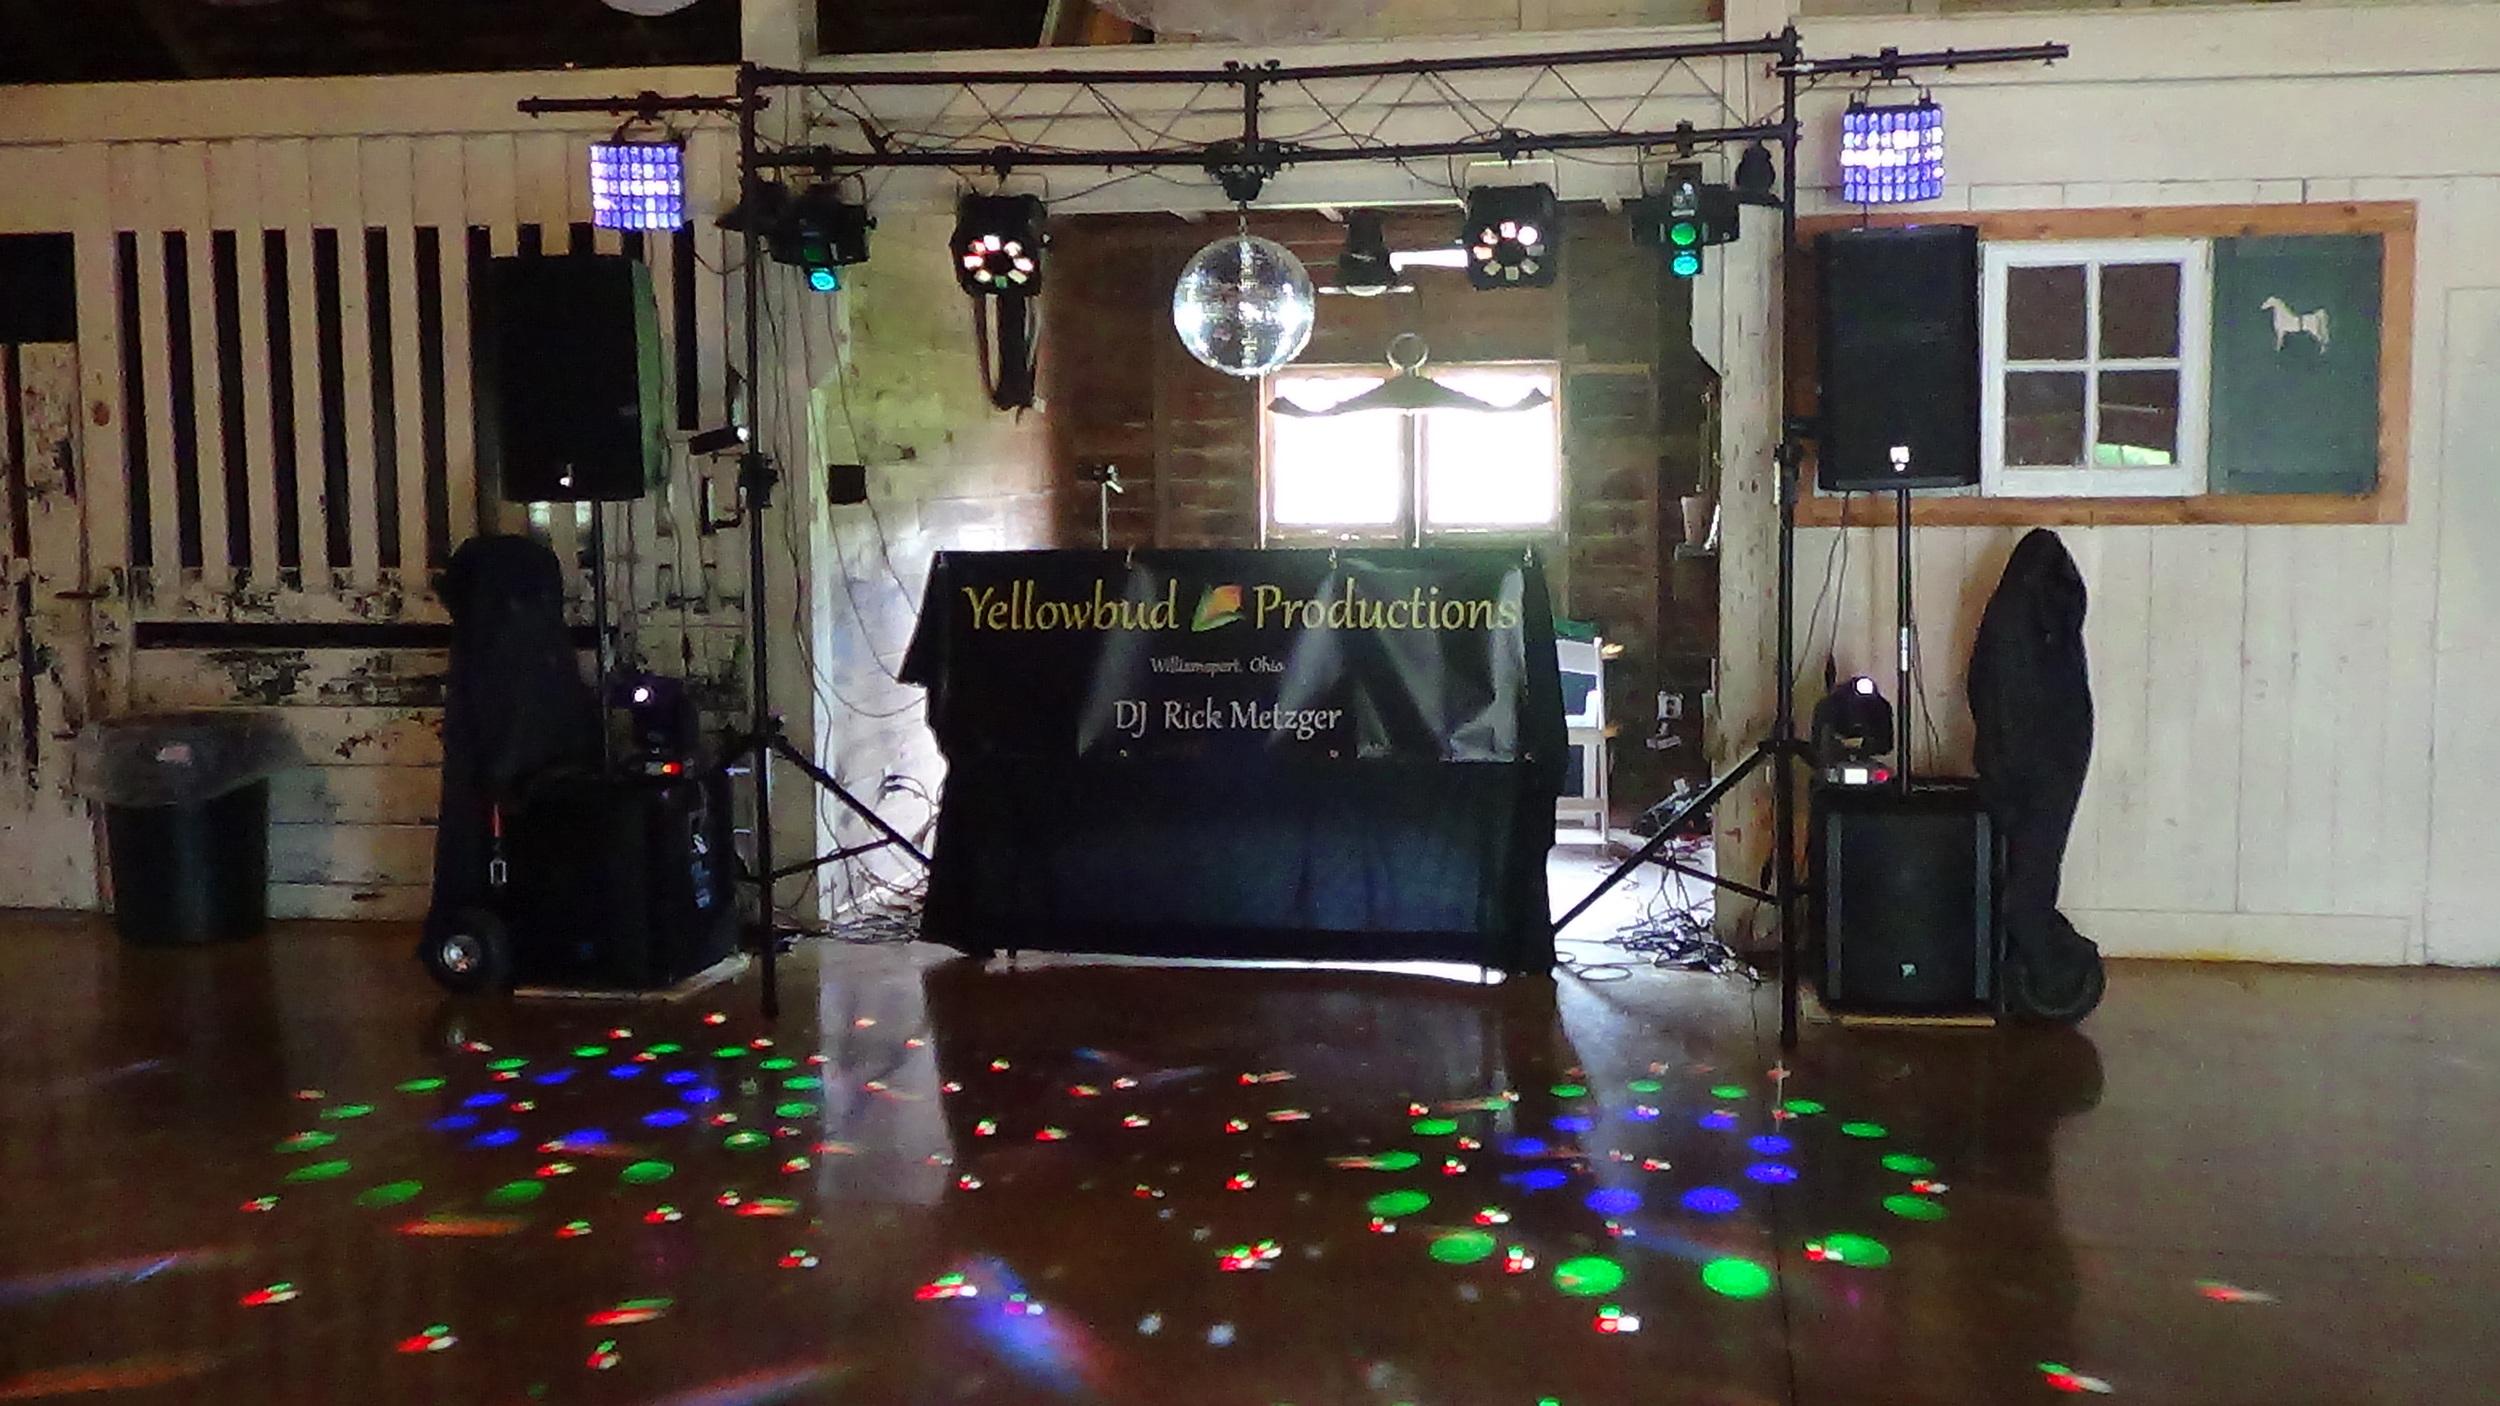 Yellowbud Productions setup at Little Brook Meadows 3.jpg